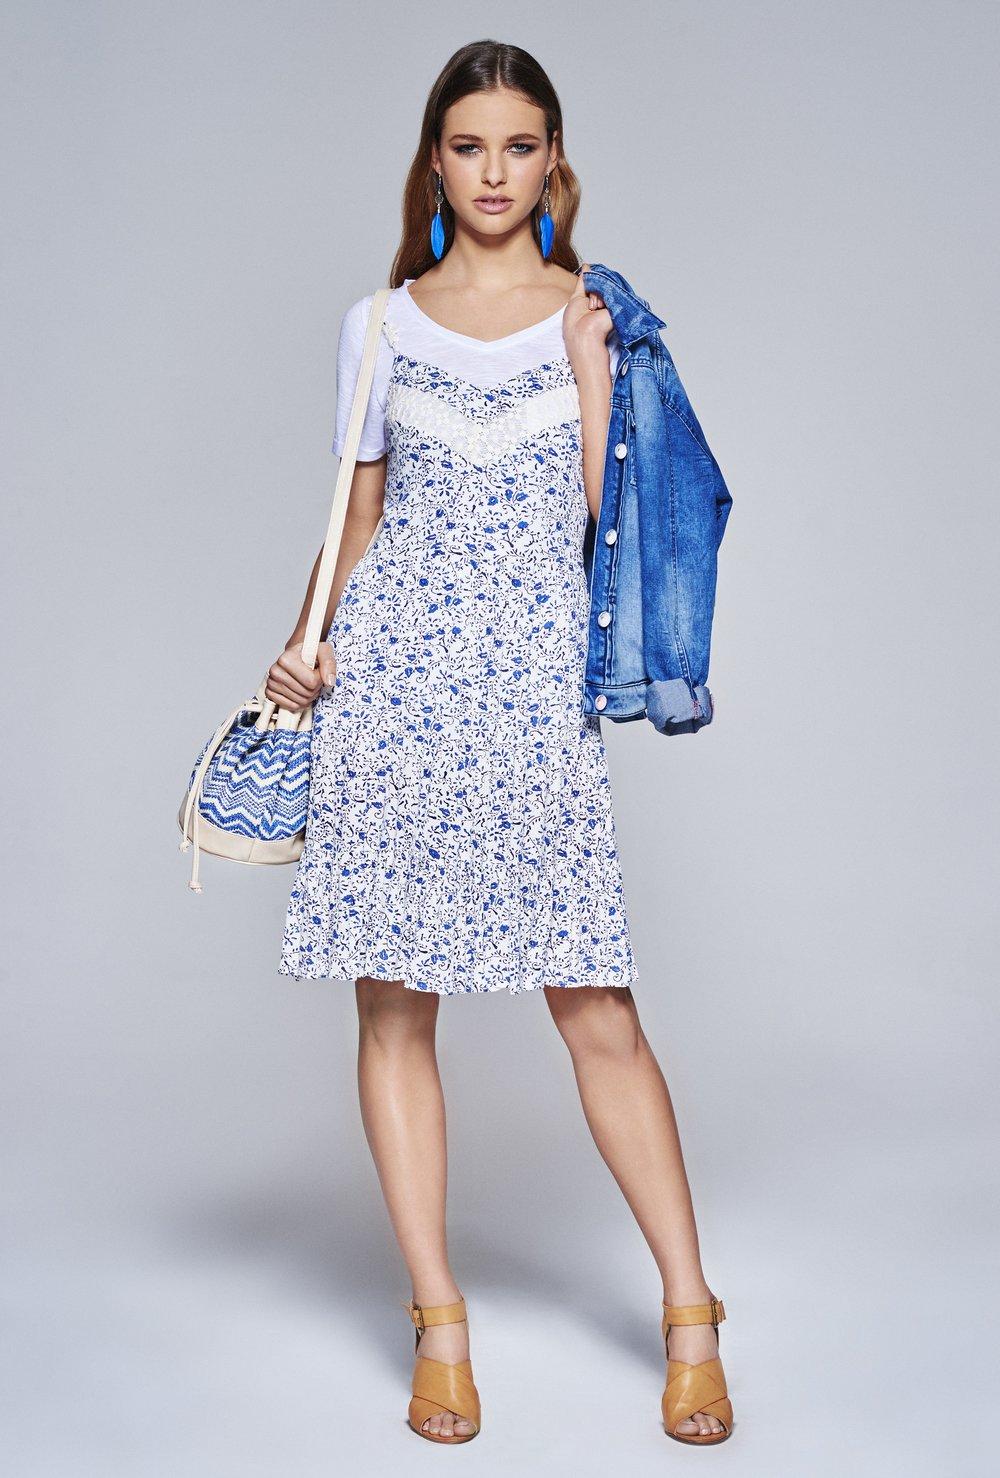 fashion-zuzmua01539.jpg